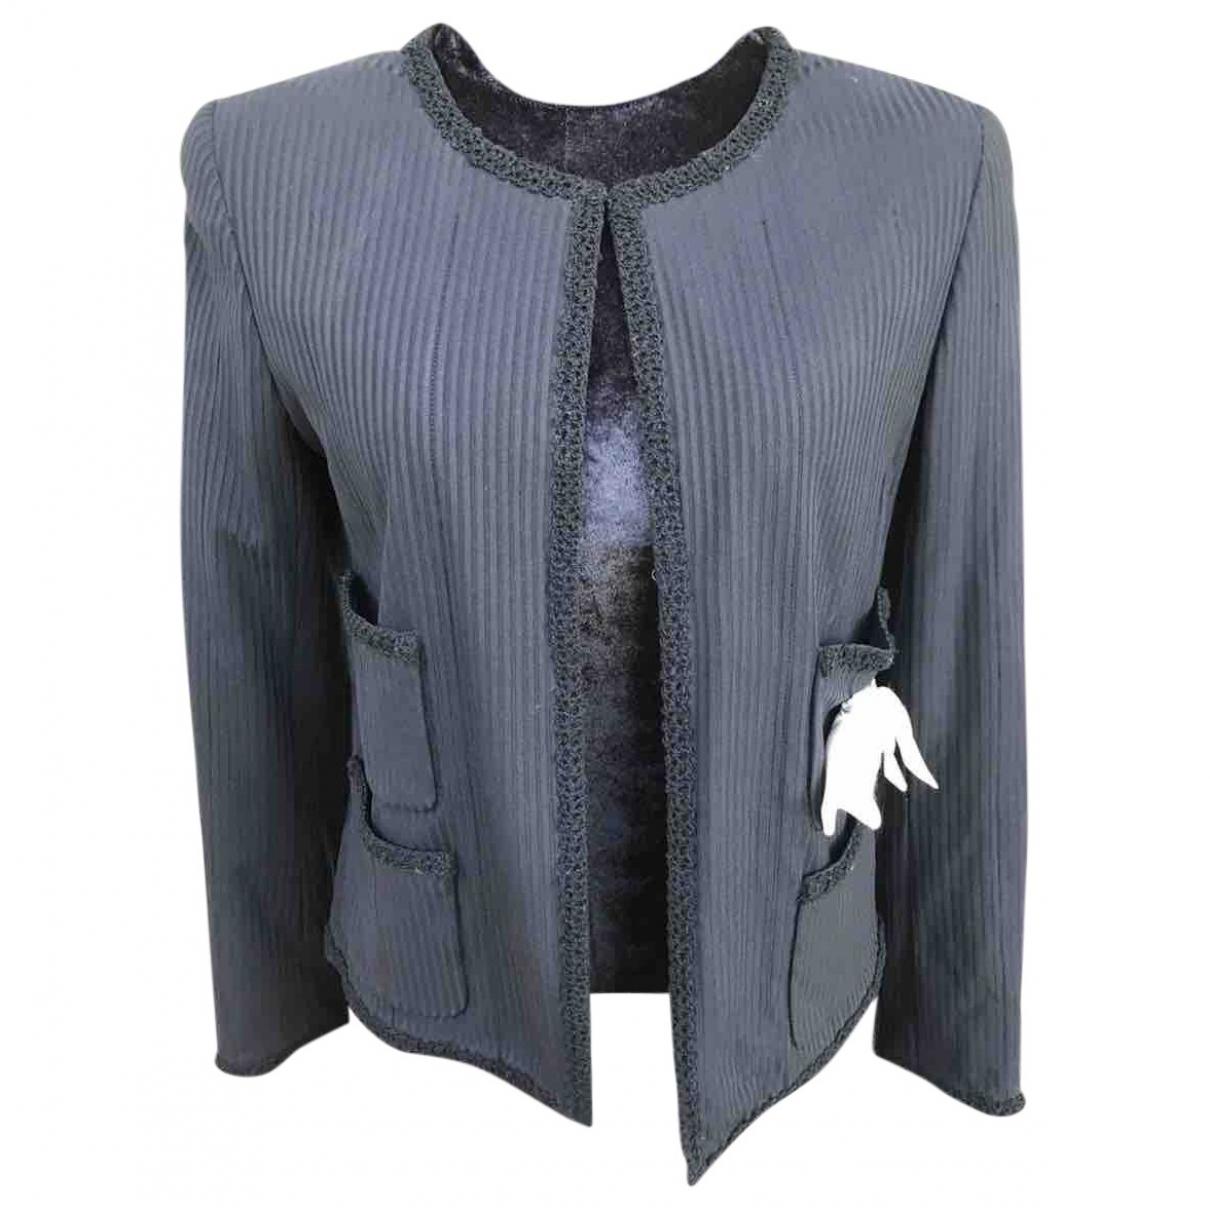 Chanel \N Black jacket for Women 38 FR